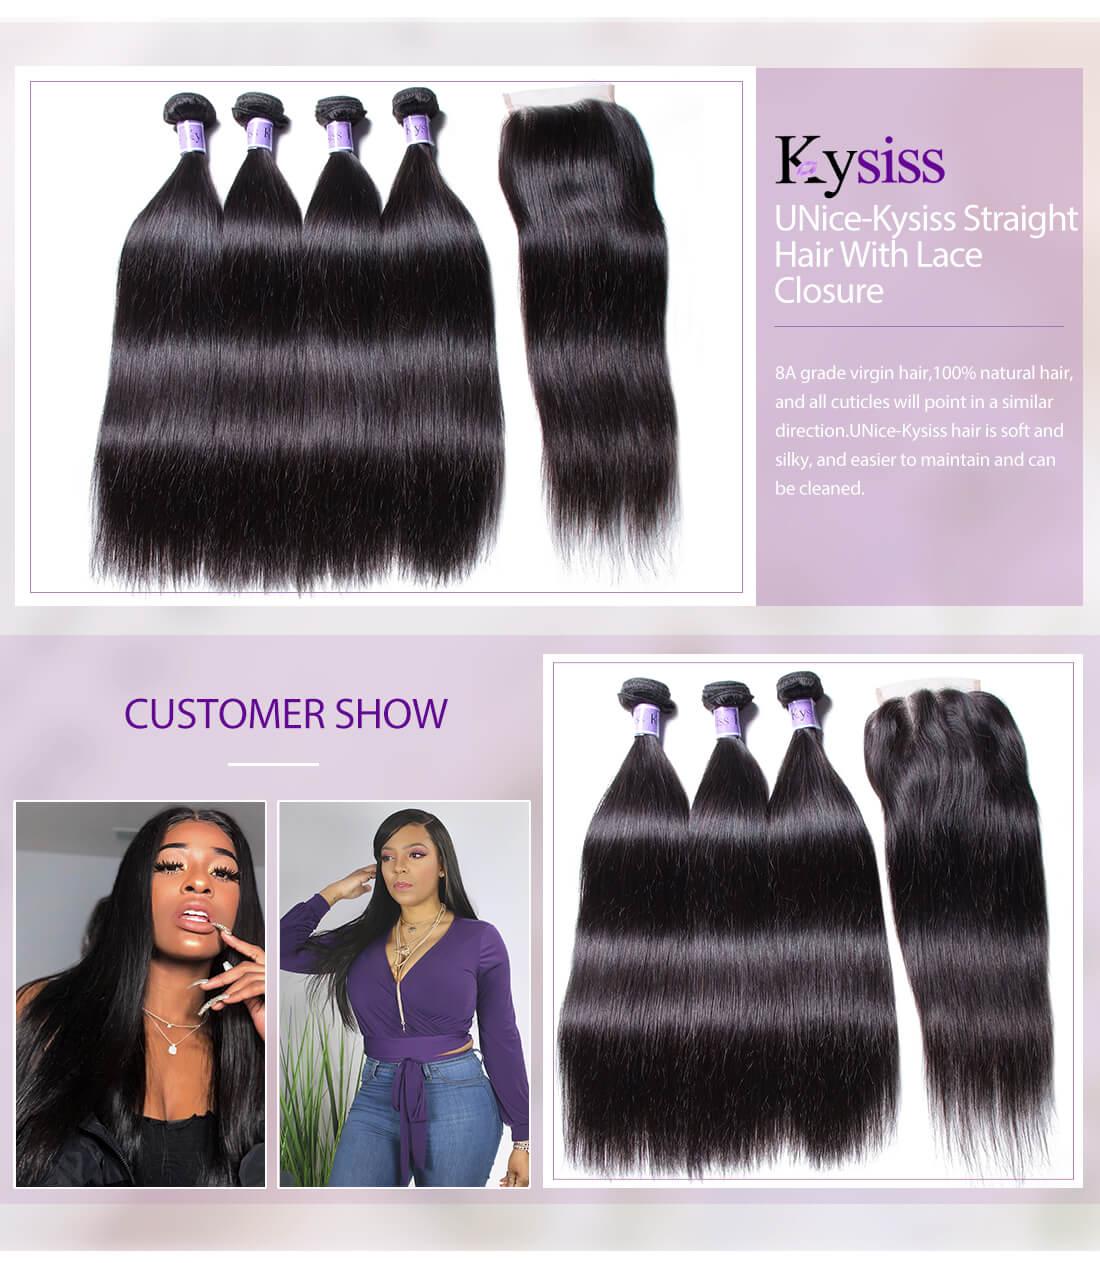 UNice Hair Kysiss Series Straight Hair With Closure